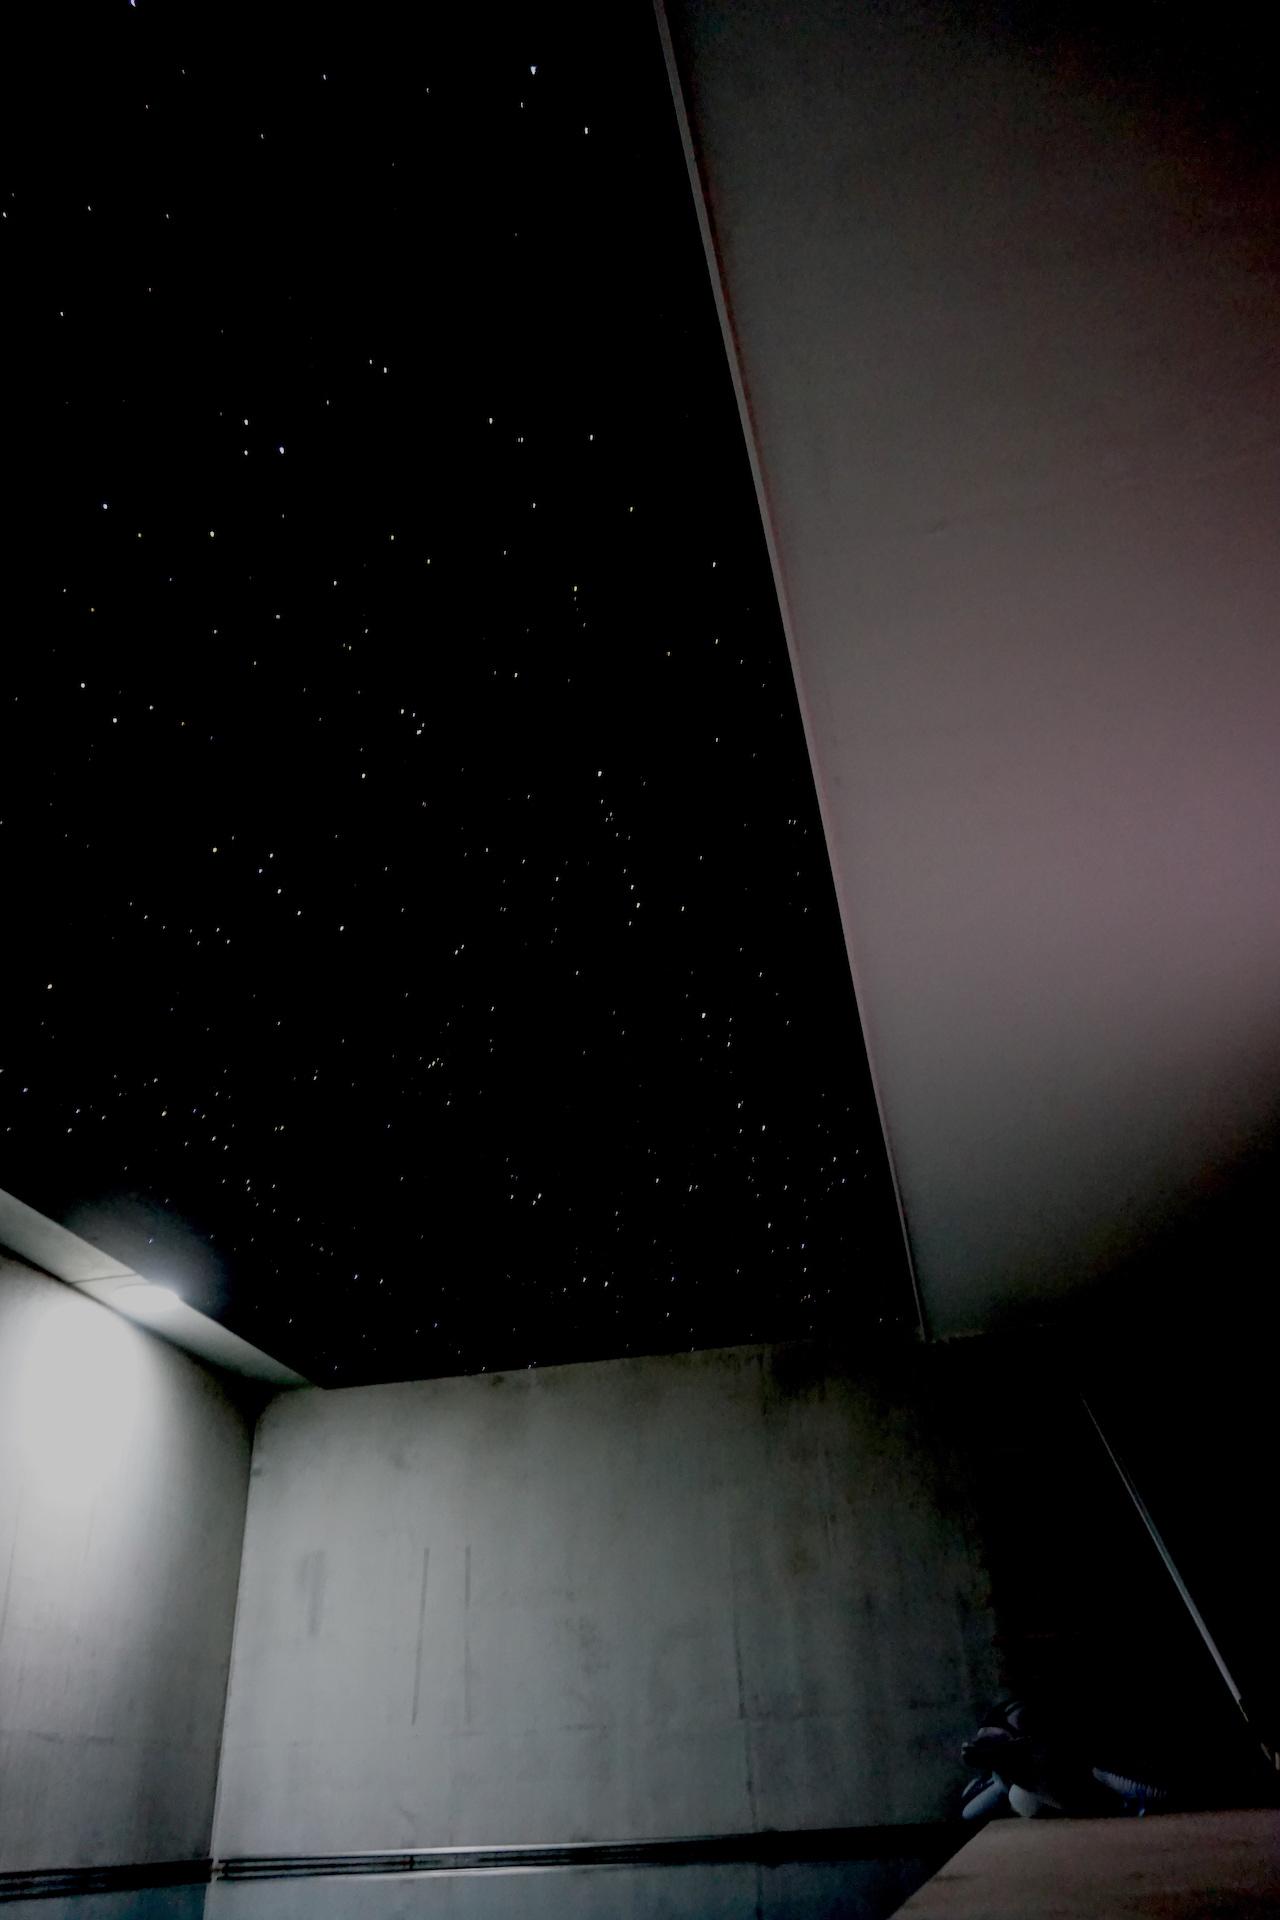 sterrenhemel jacuzzi verlichting zwembad plafond led glasvezel MyCosmos techniek licht sterren wellness pool